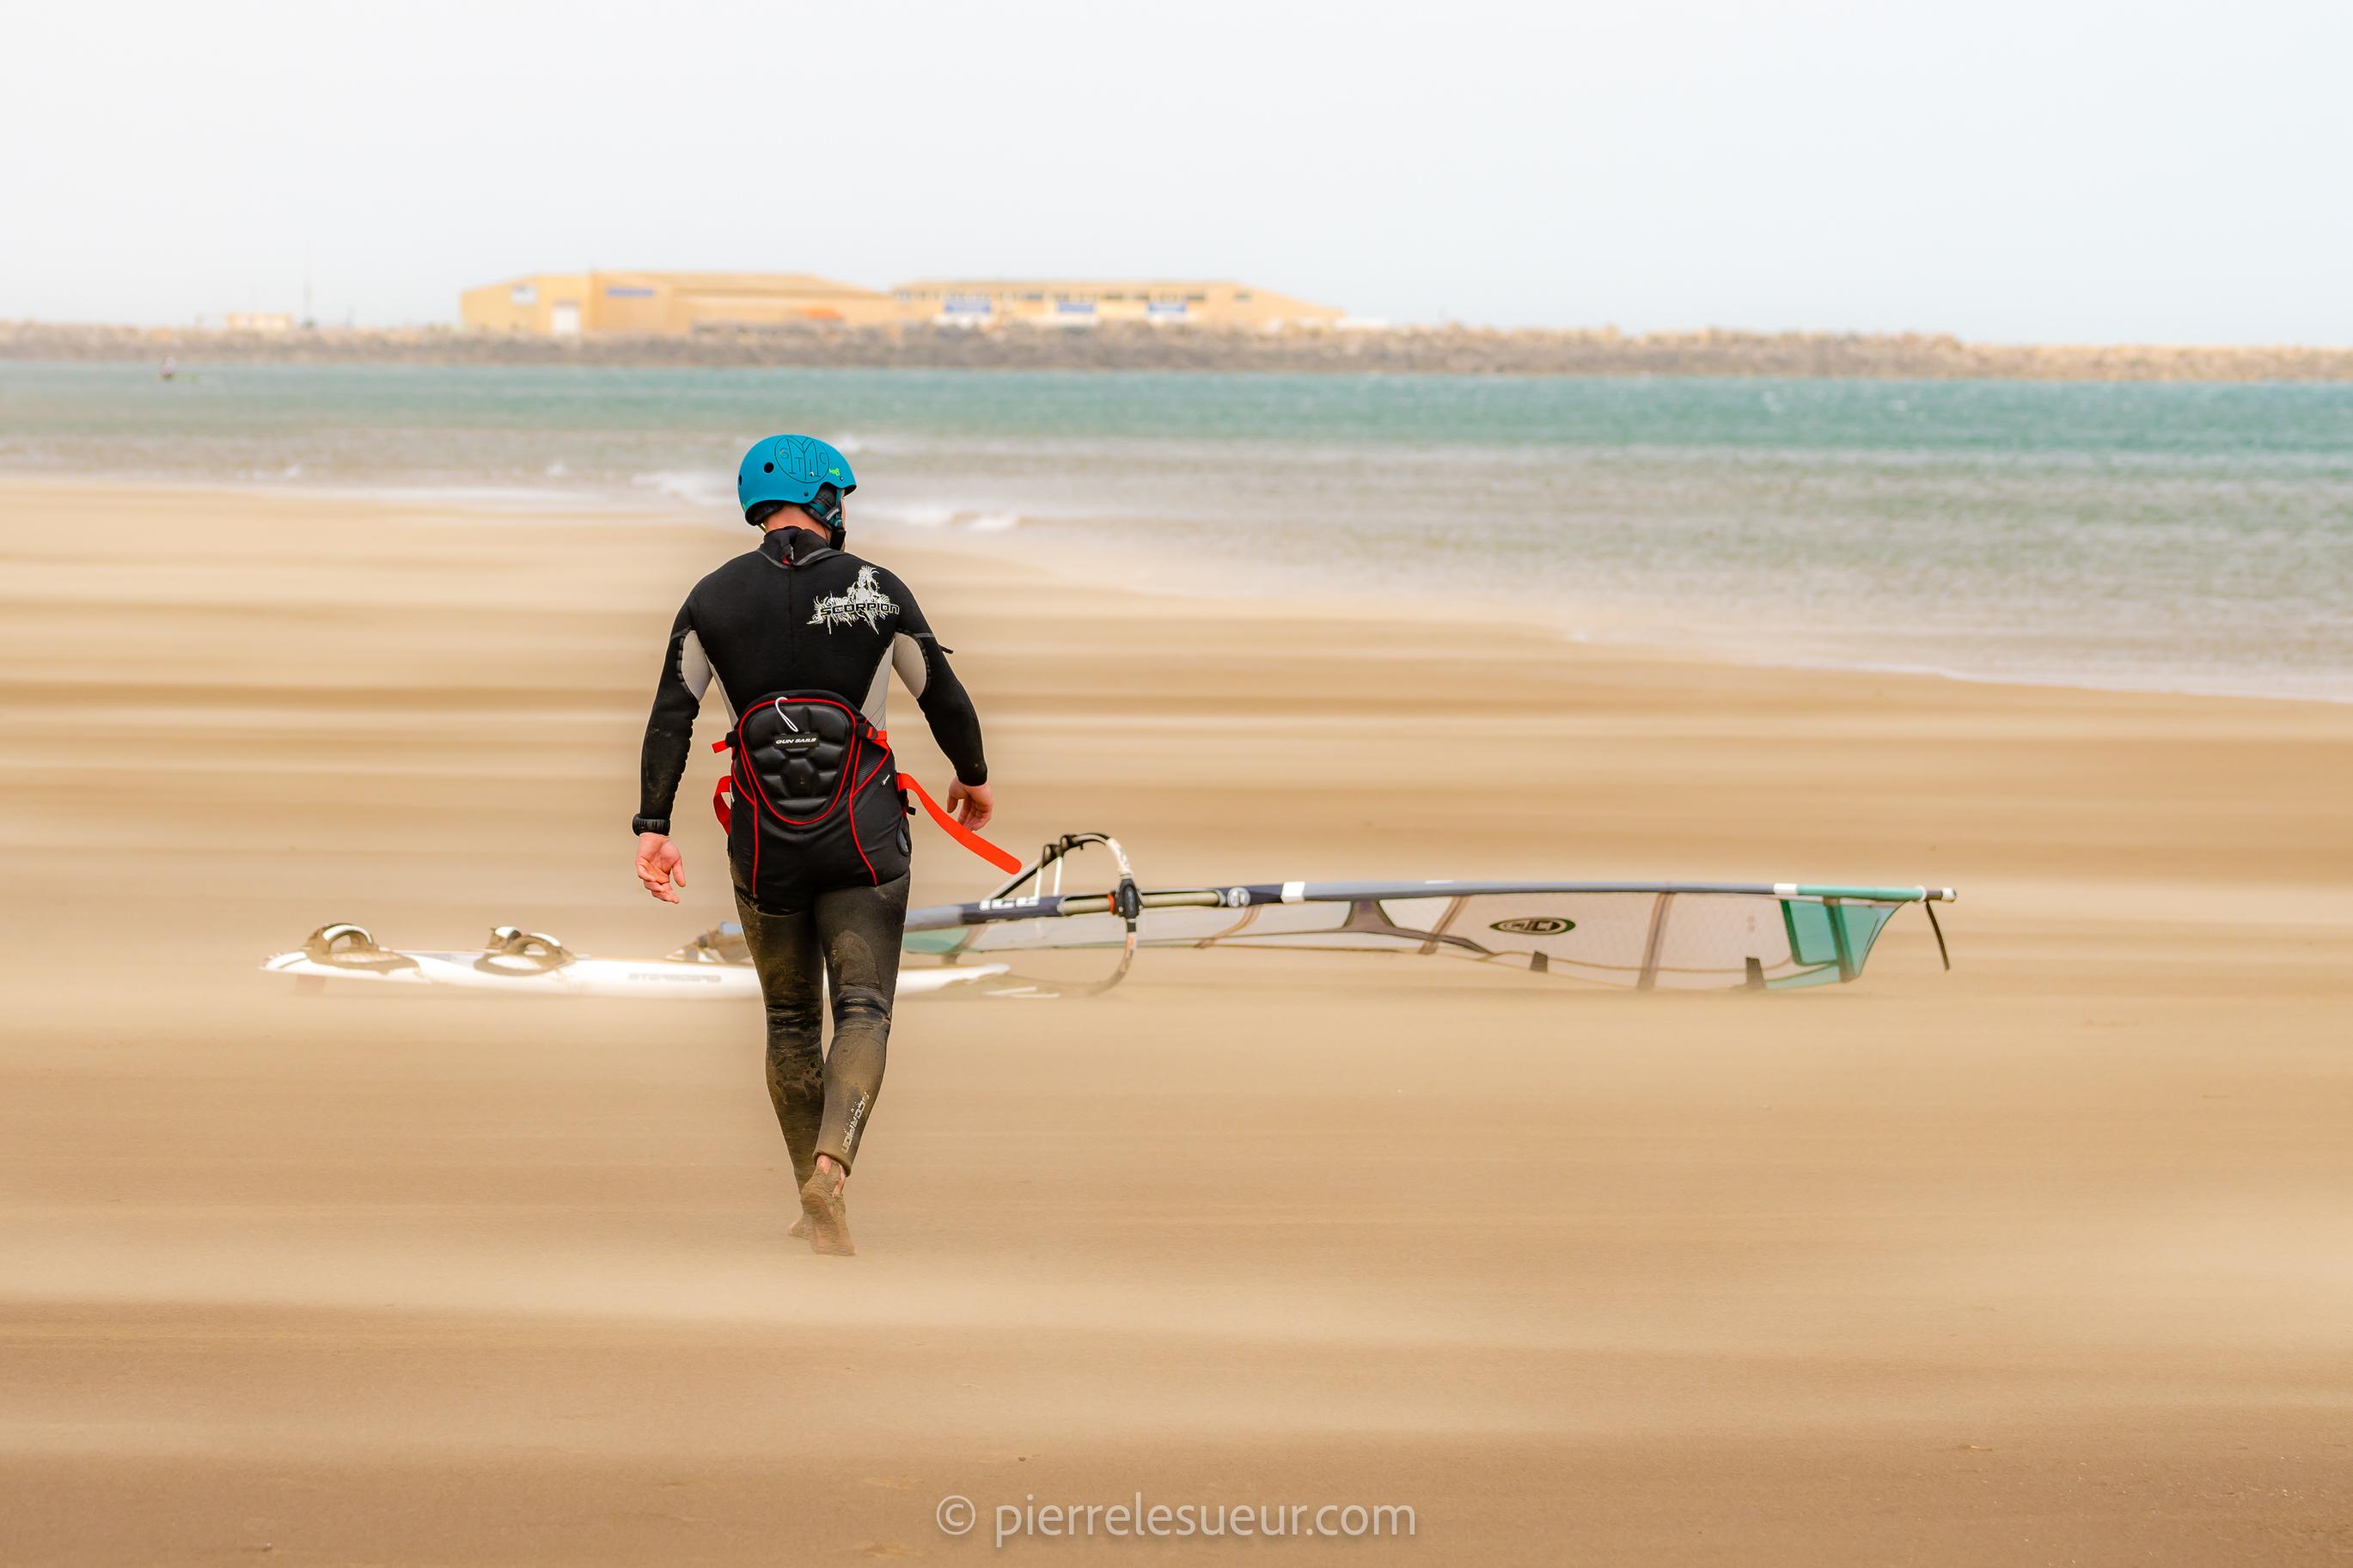 04052018-Photo-Windsurf-Kitesurf-VTT-MoutainBike-PL-2-34